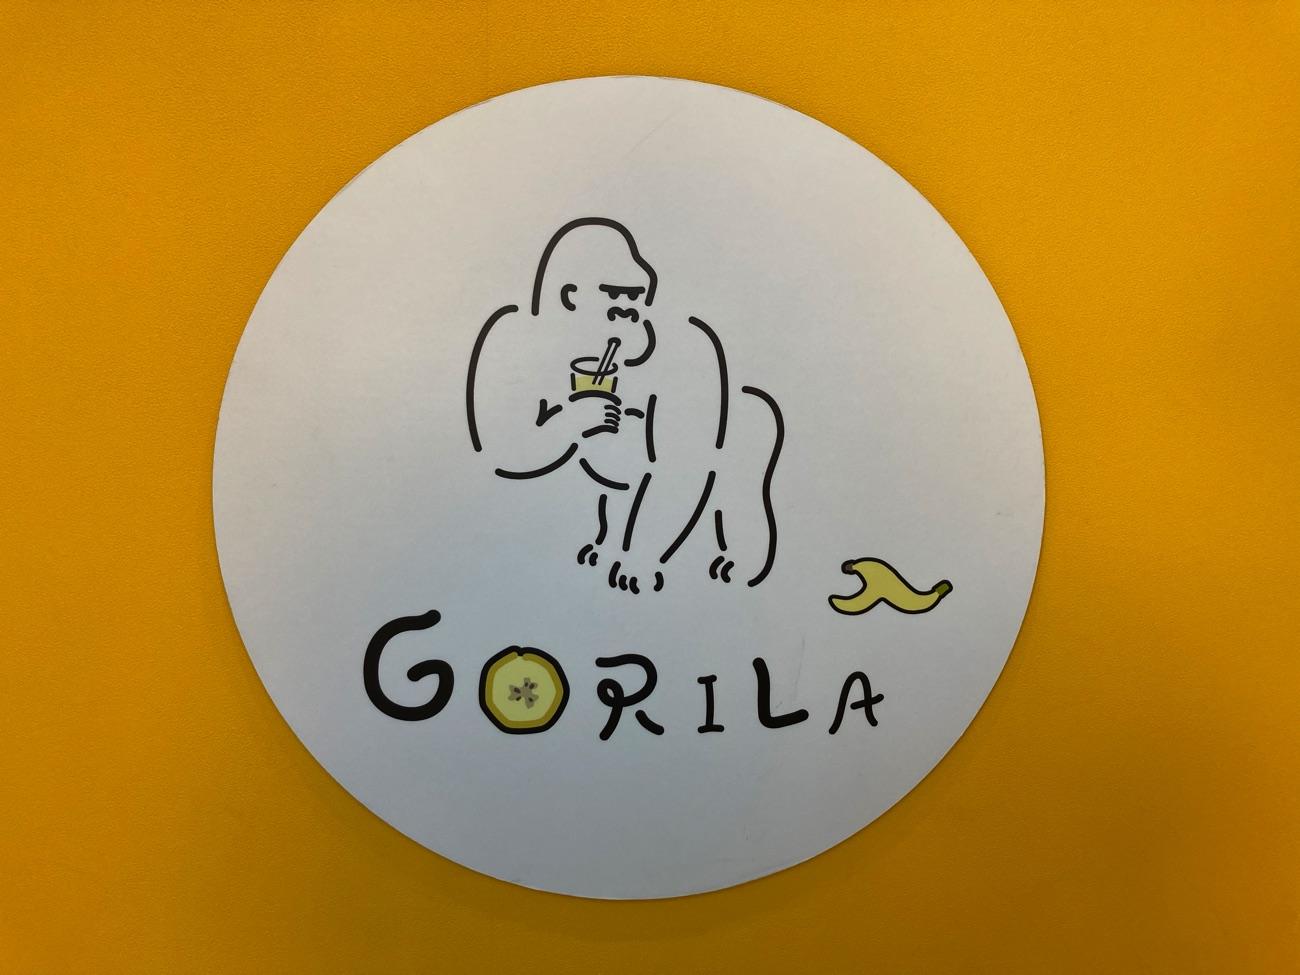 「GORILA(ゴリラ)」のロゴ